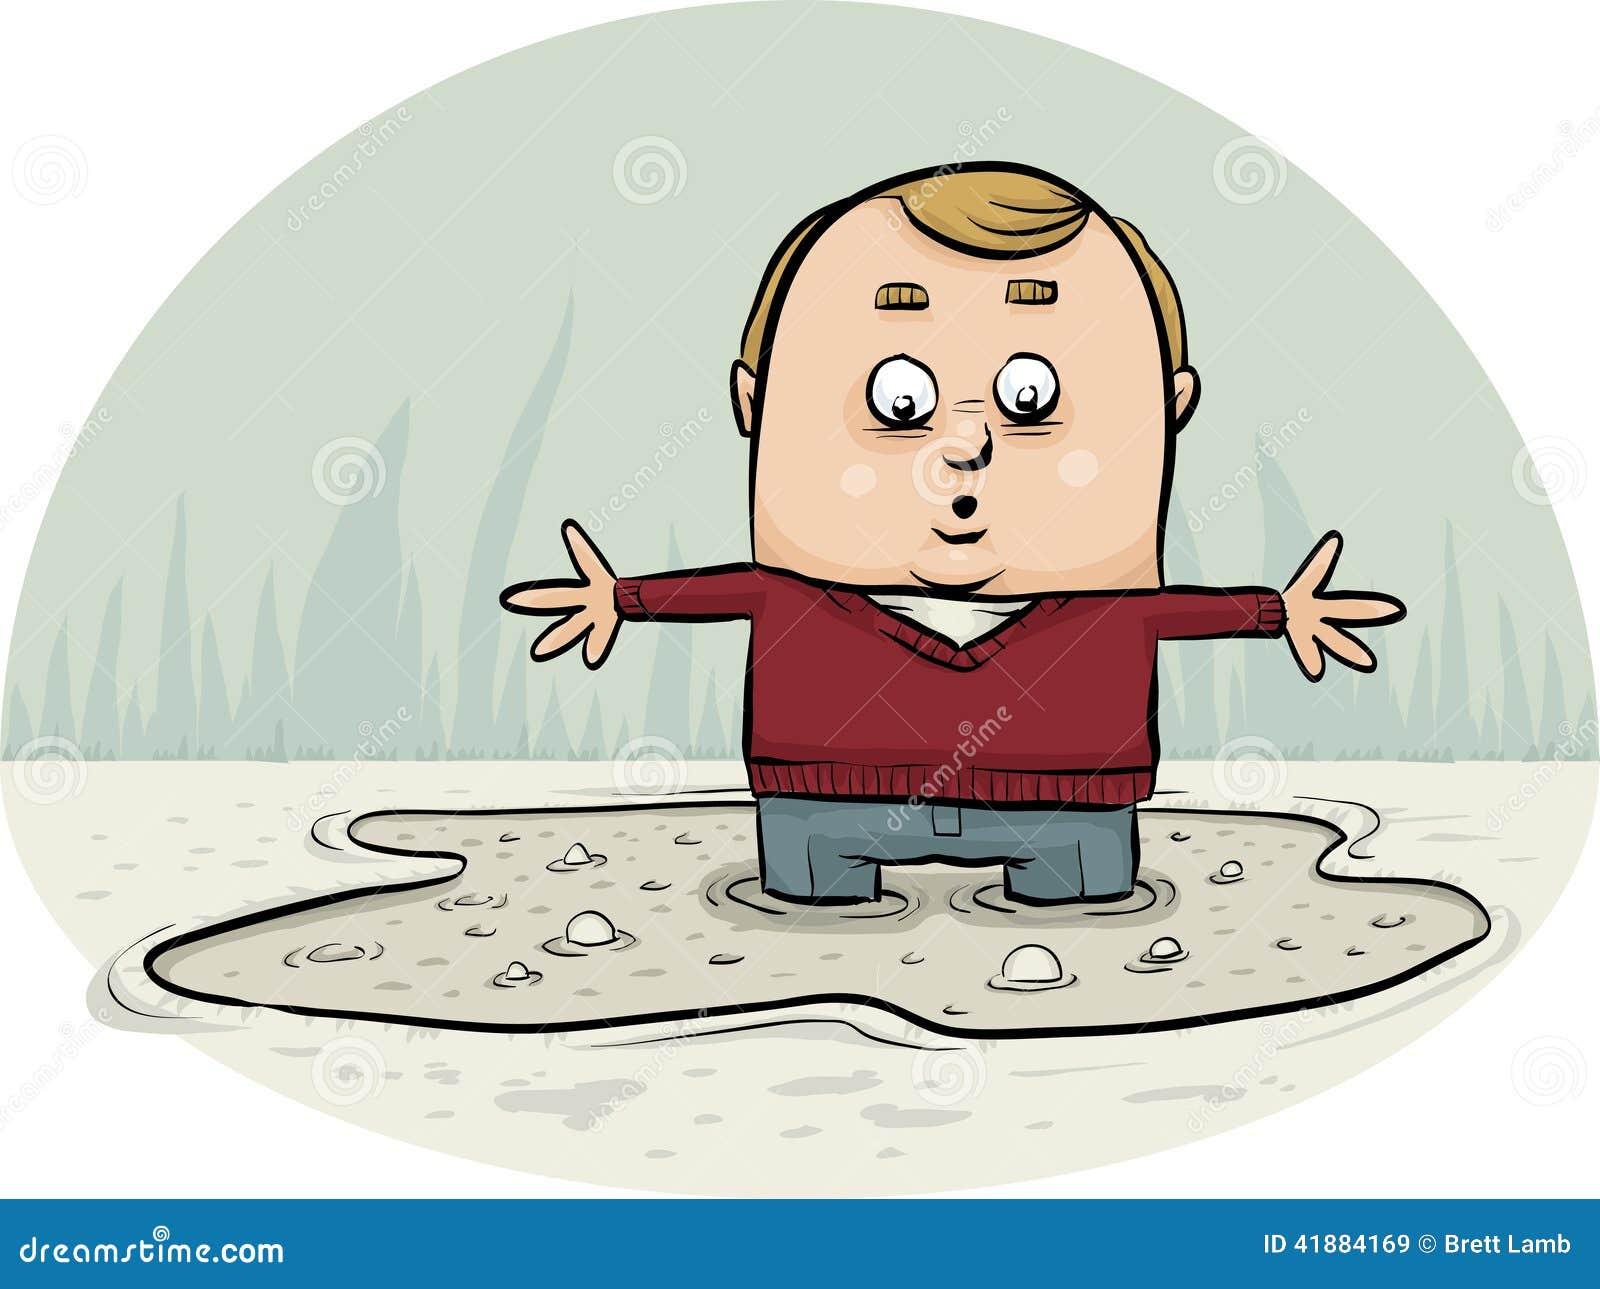 Sinking In Quicksand Stock Illustration - Image: 41884169